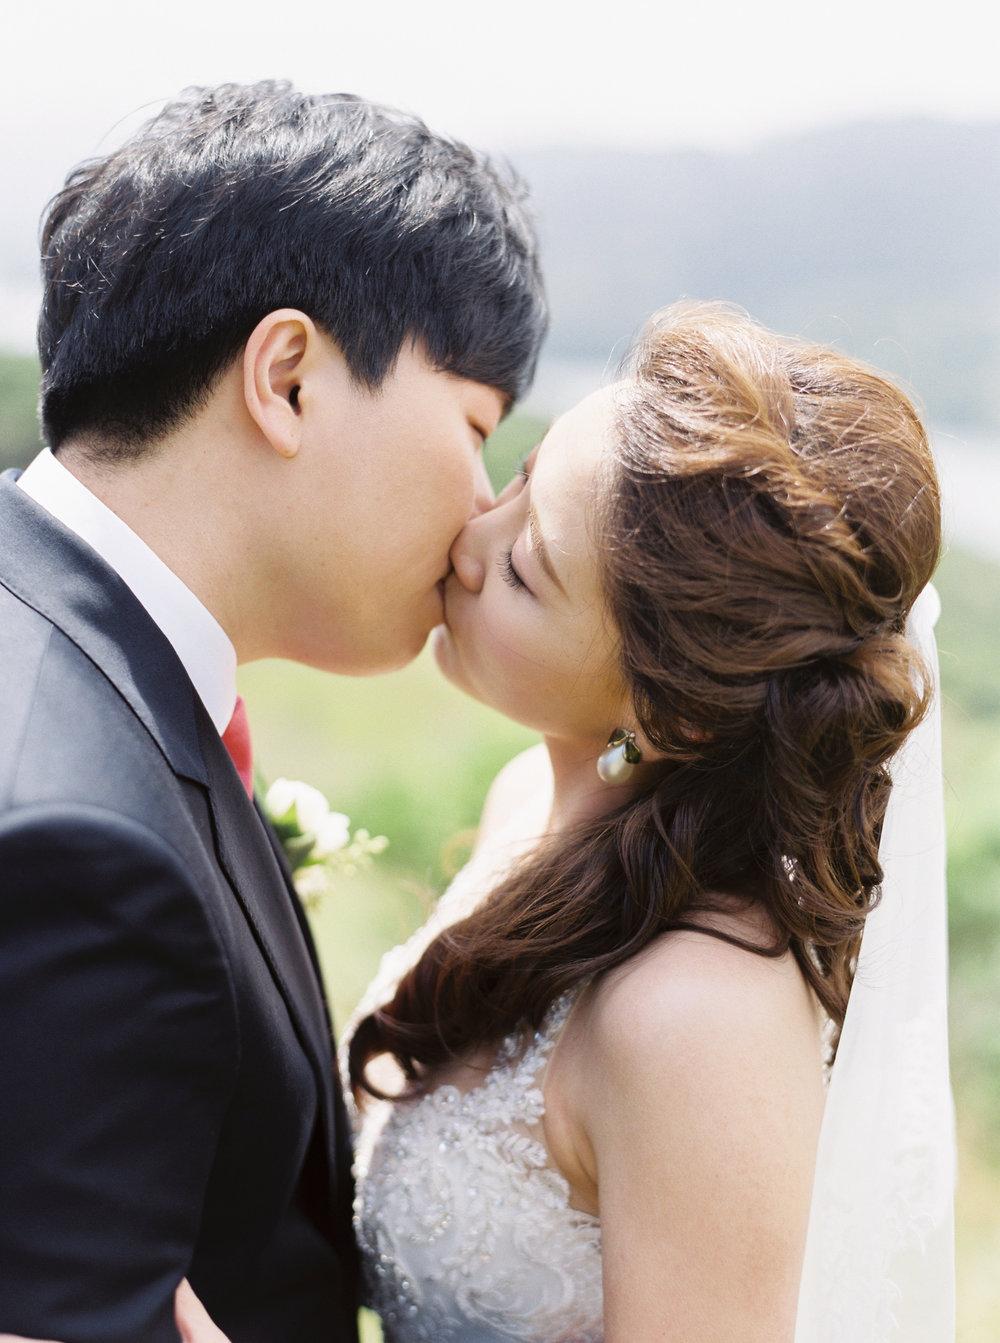 mountaintop-wedding-at-crystal-springs-burlingame-california-10-2.jpg